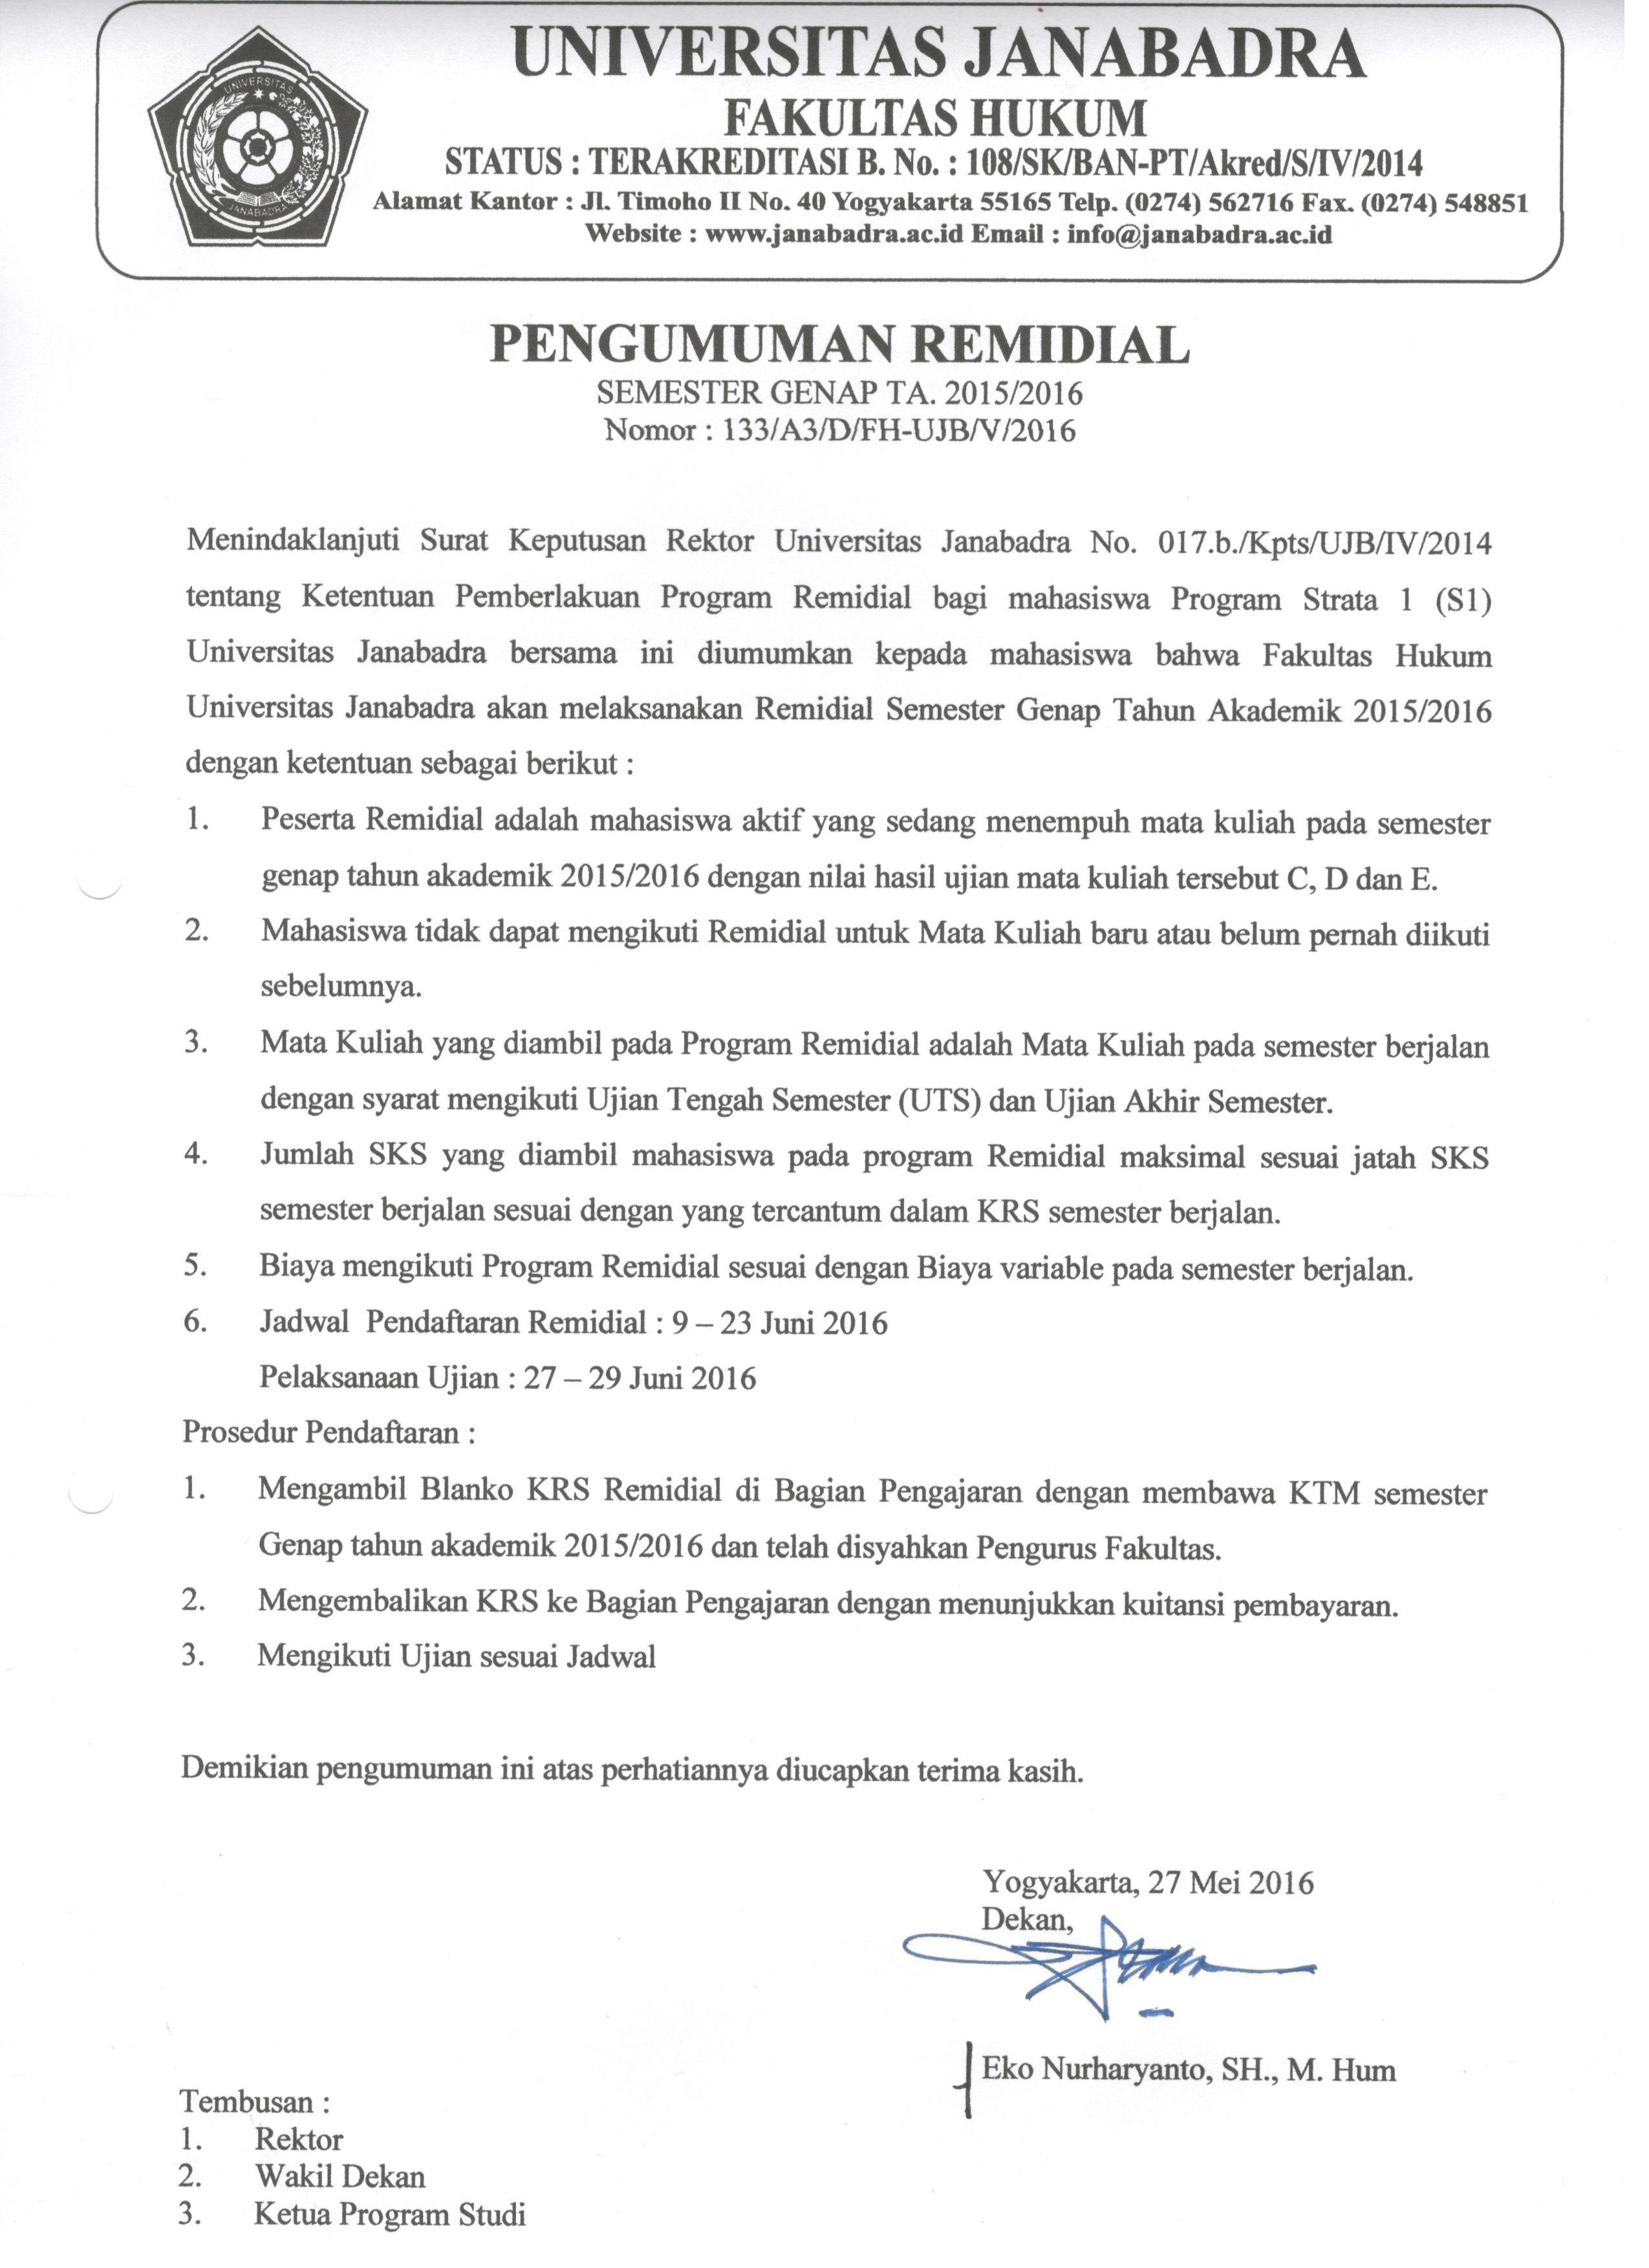 PENGUMUMAN REMIDIAL SEMESTER GENAP TAHUN AKADEMIK 2015/2016